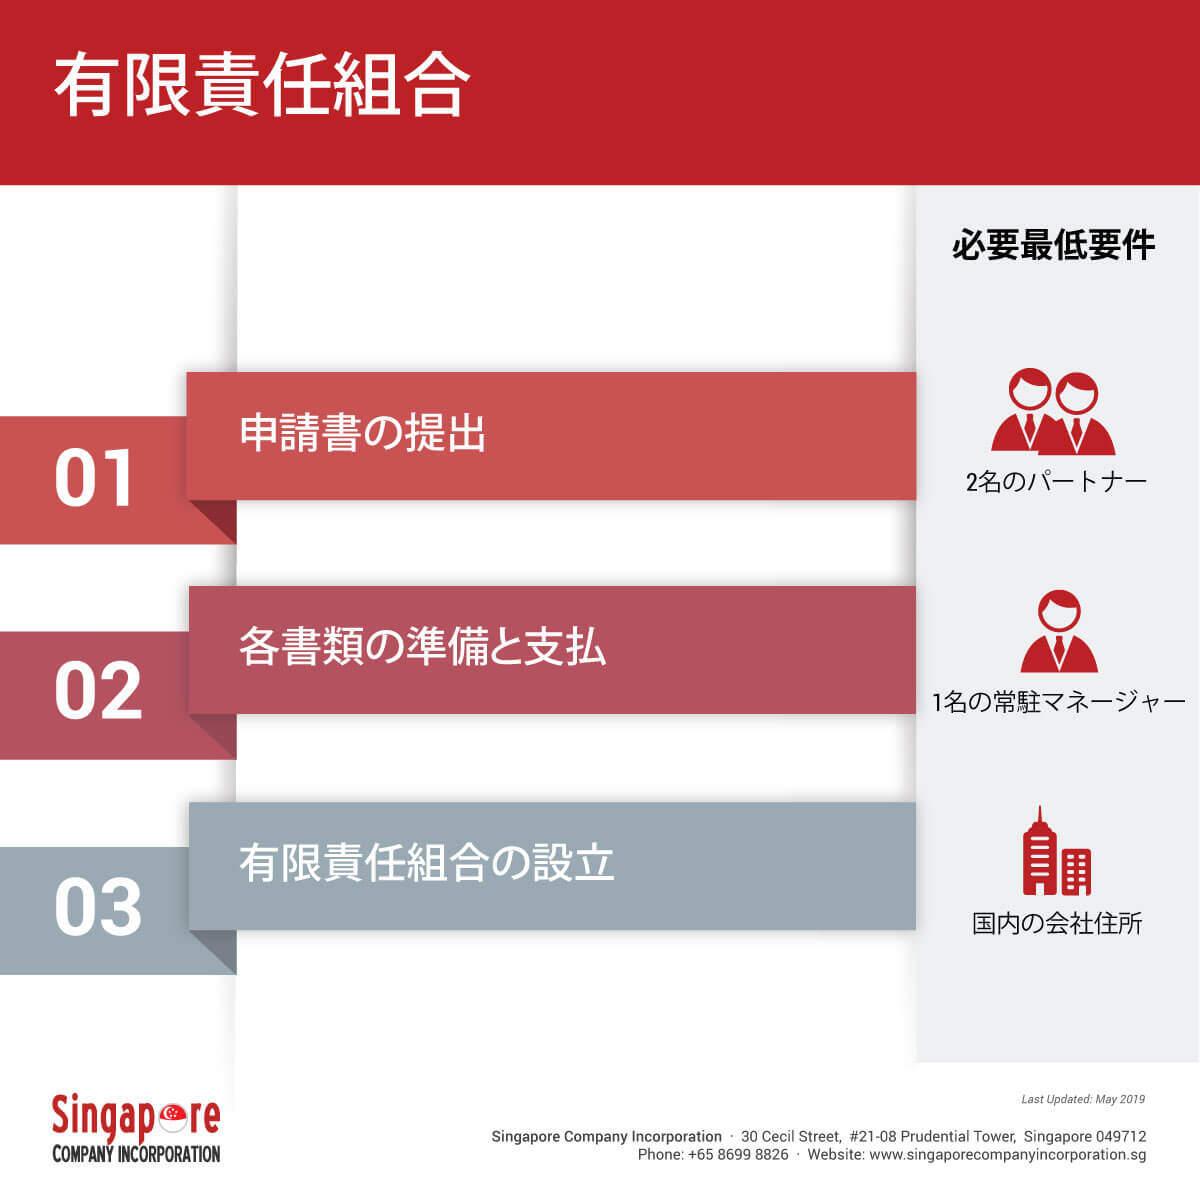 singapore-limited-liability-partnership シンガポールの有限責任組合